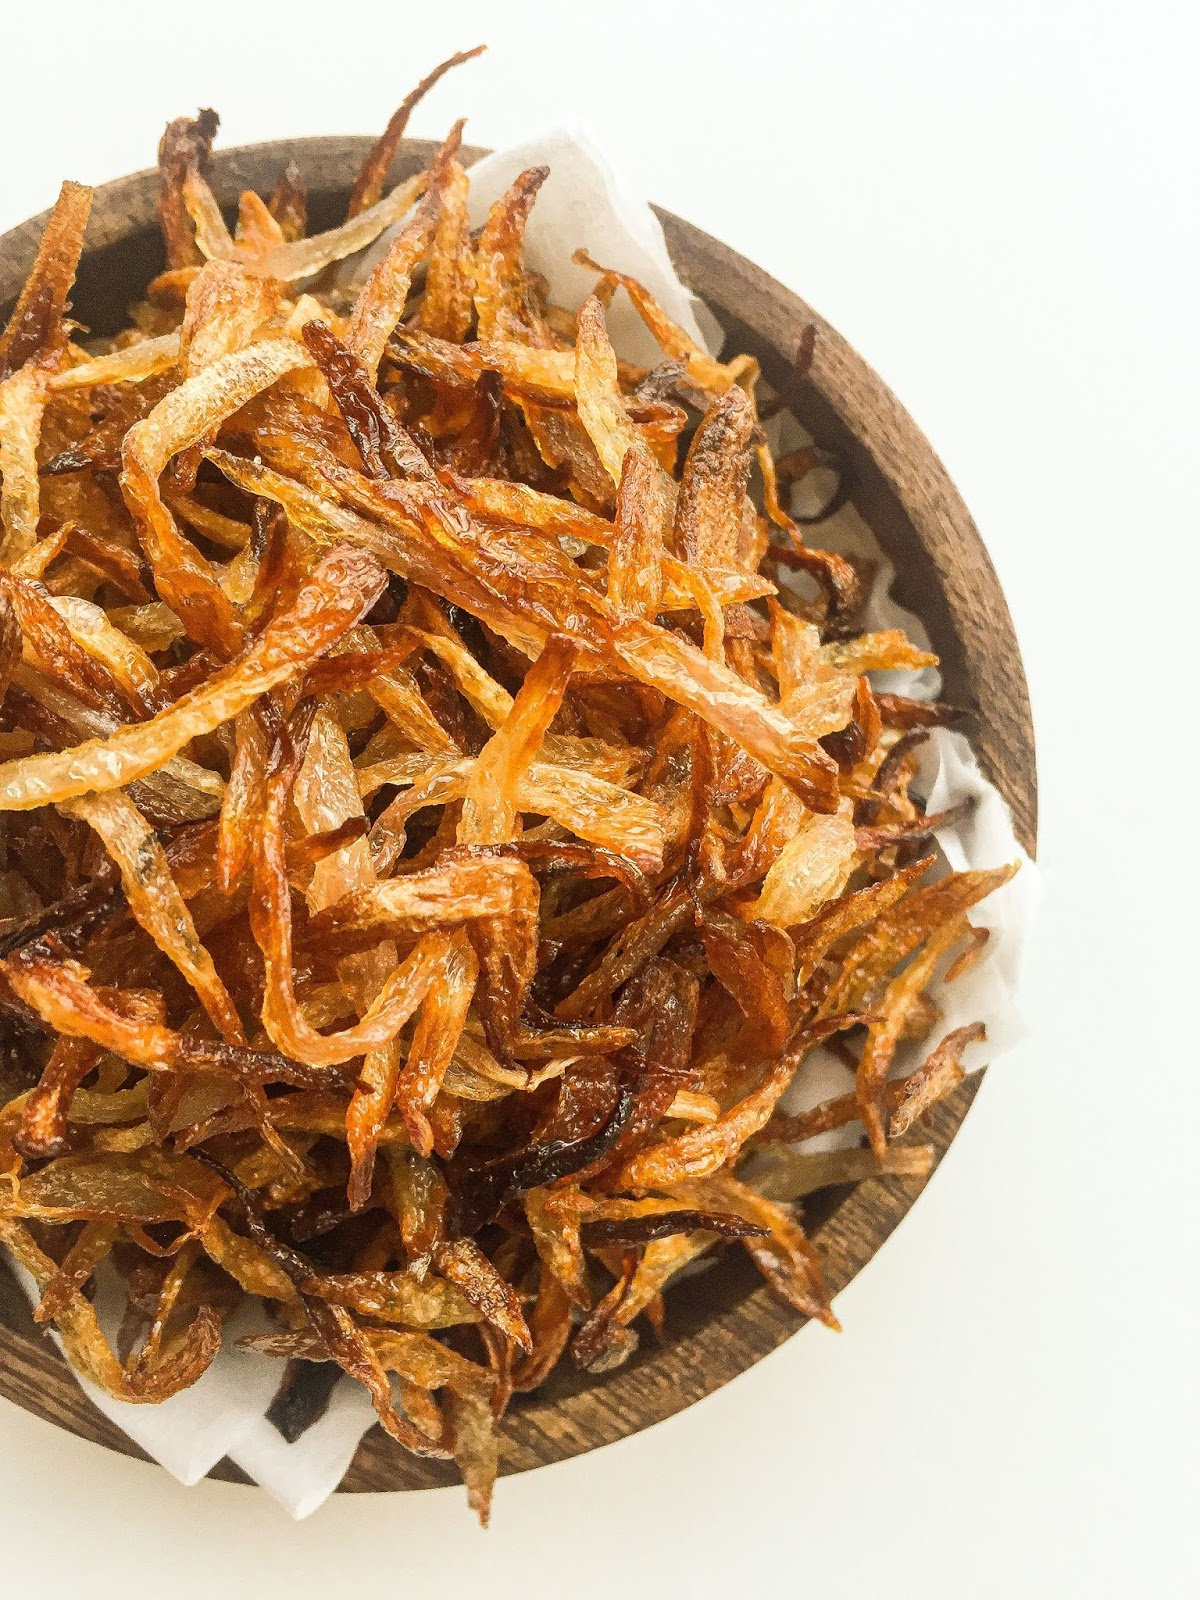 golden fried onions